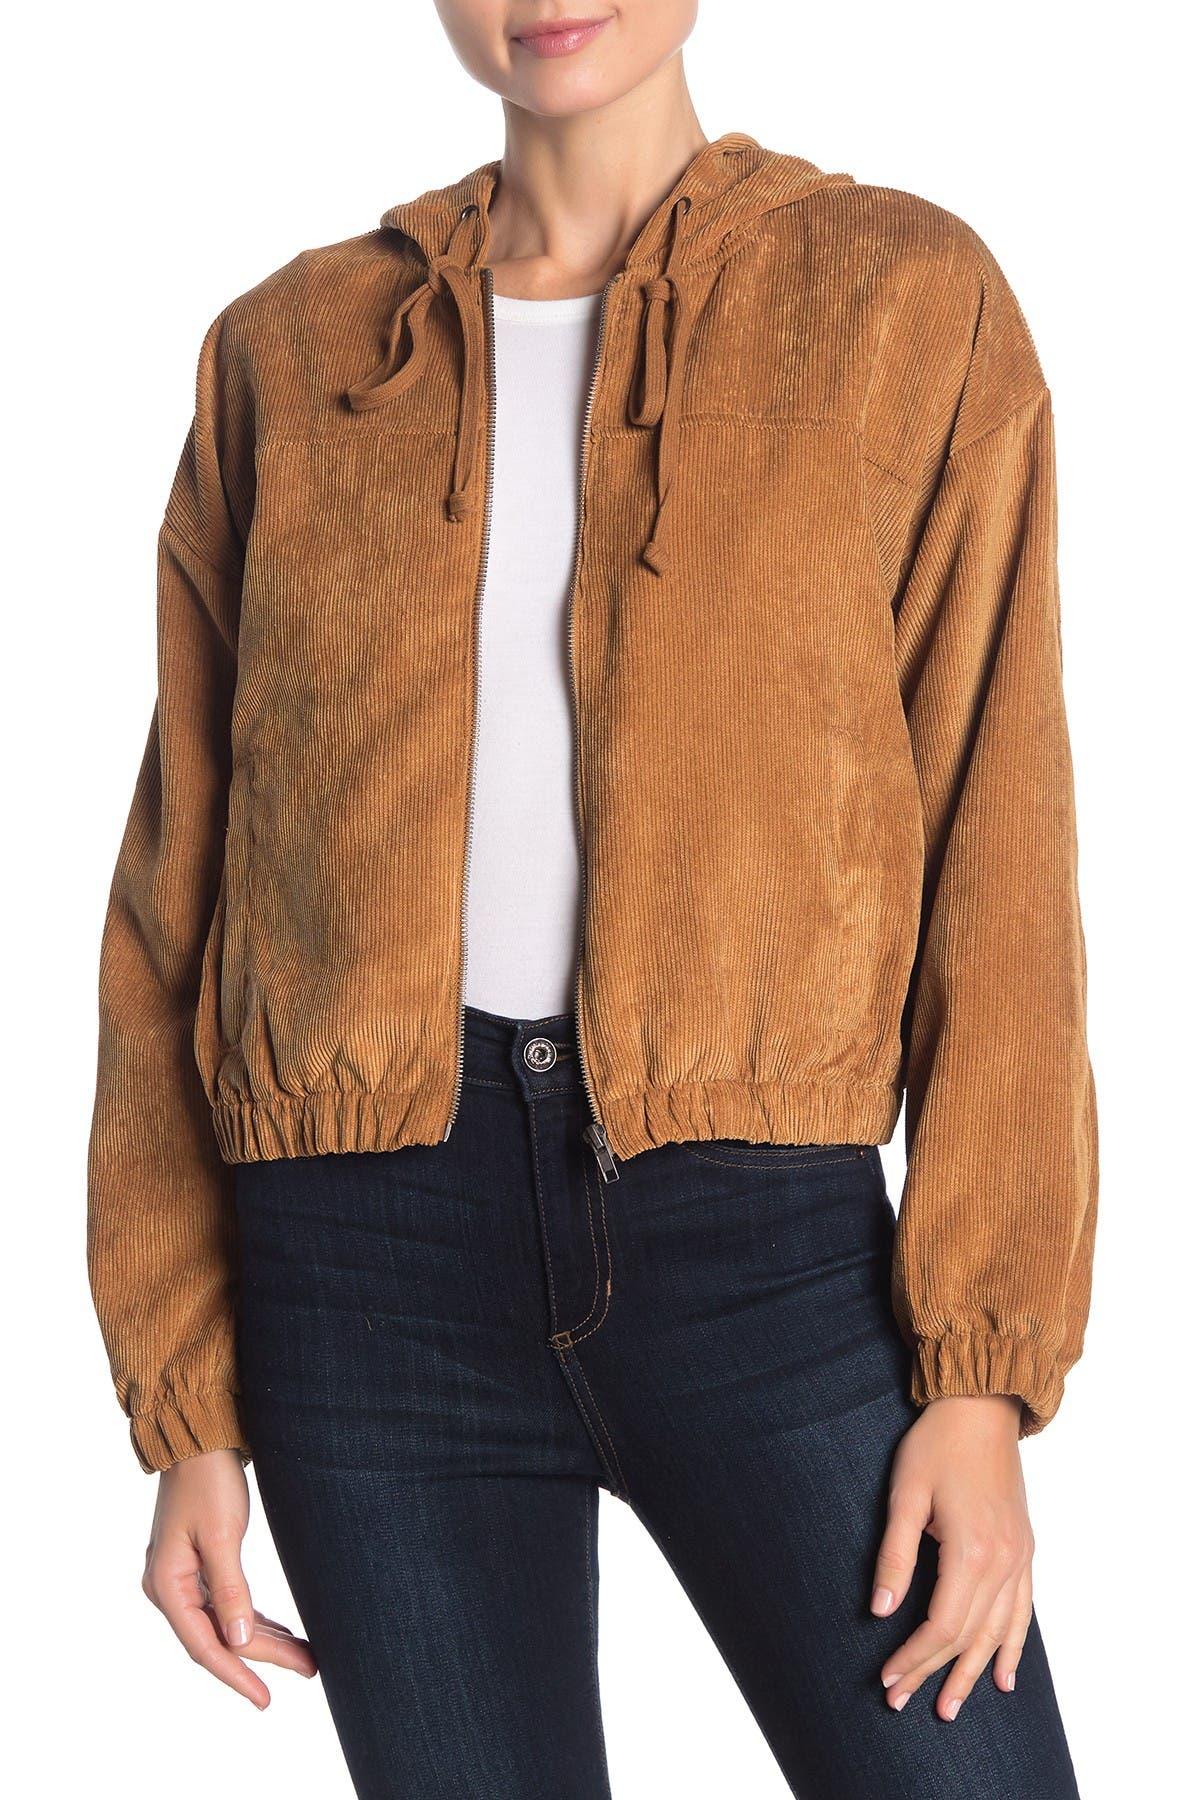 Image of Blu Pepper Corduroy Hooded Jacket